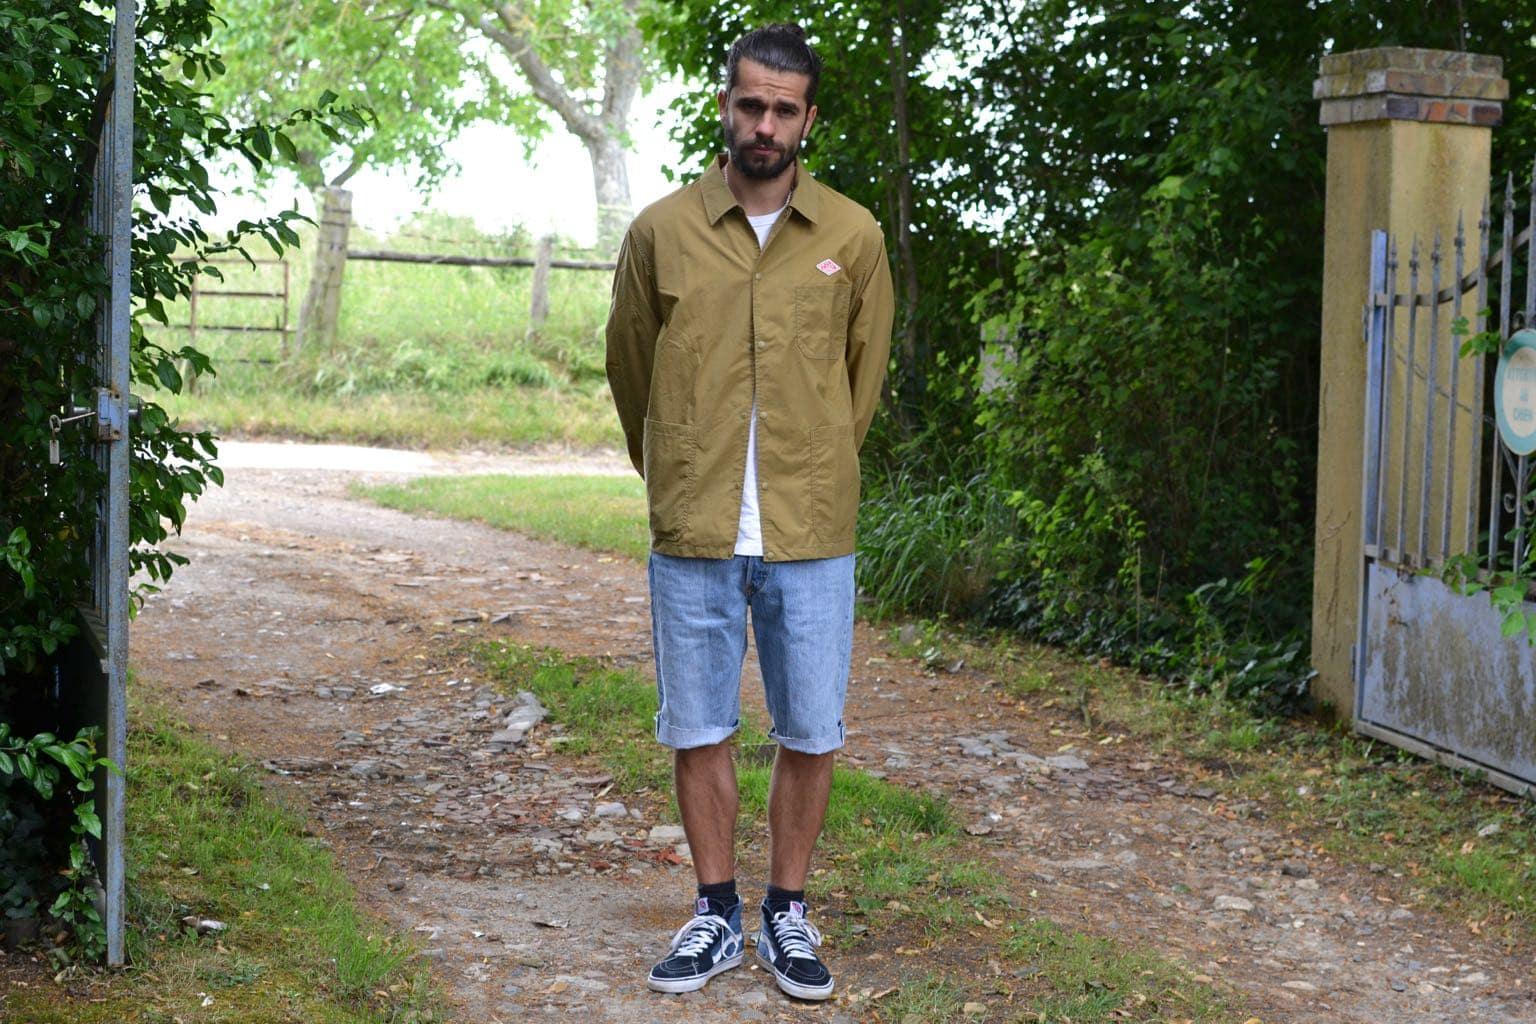 Danton marque workwear française et nylon taffeta jacket look homme